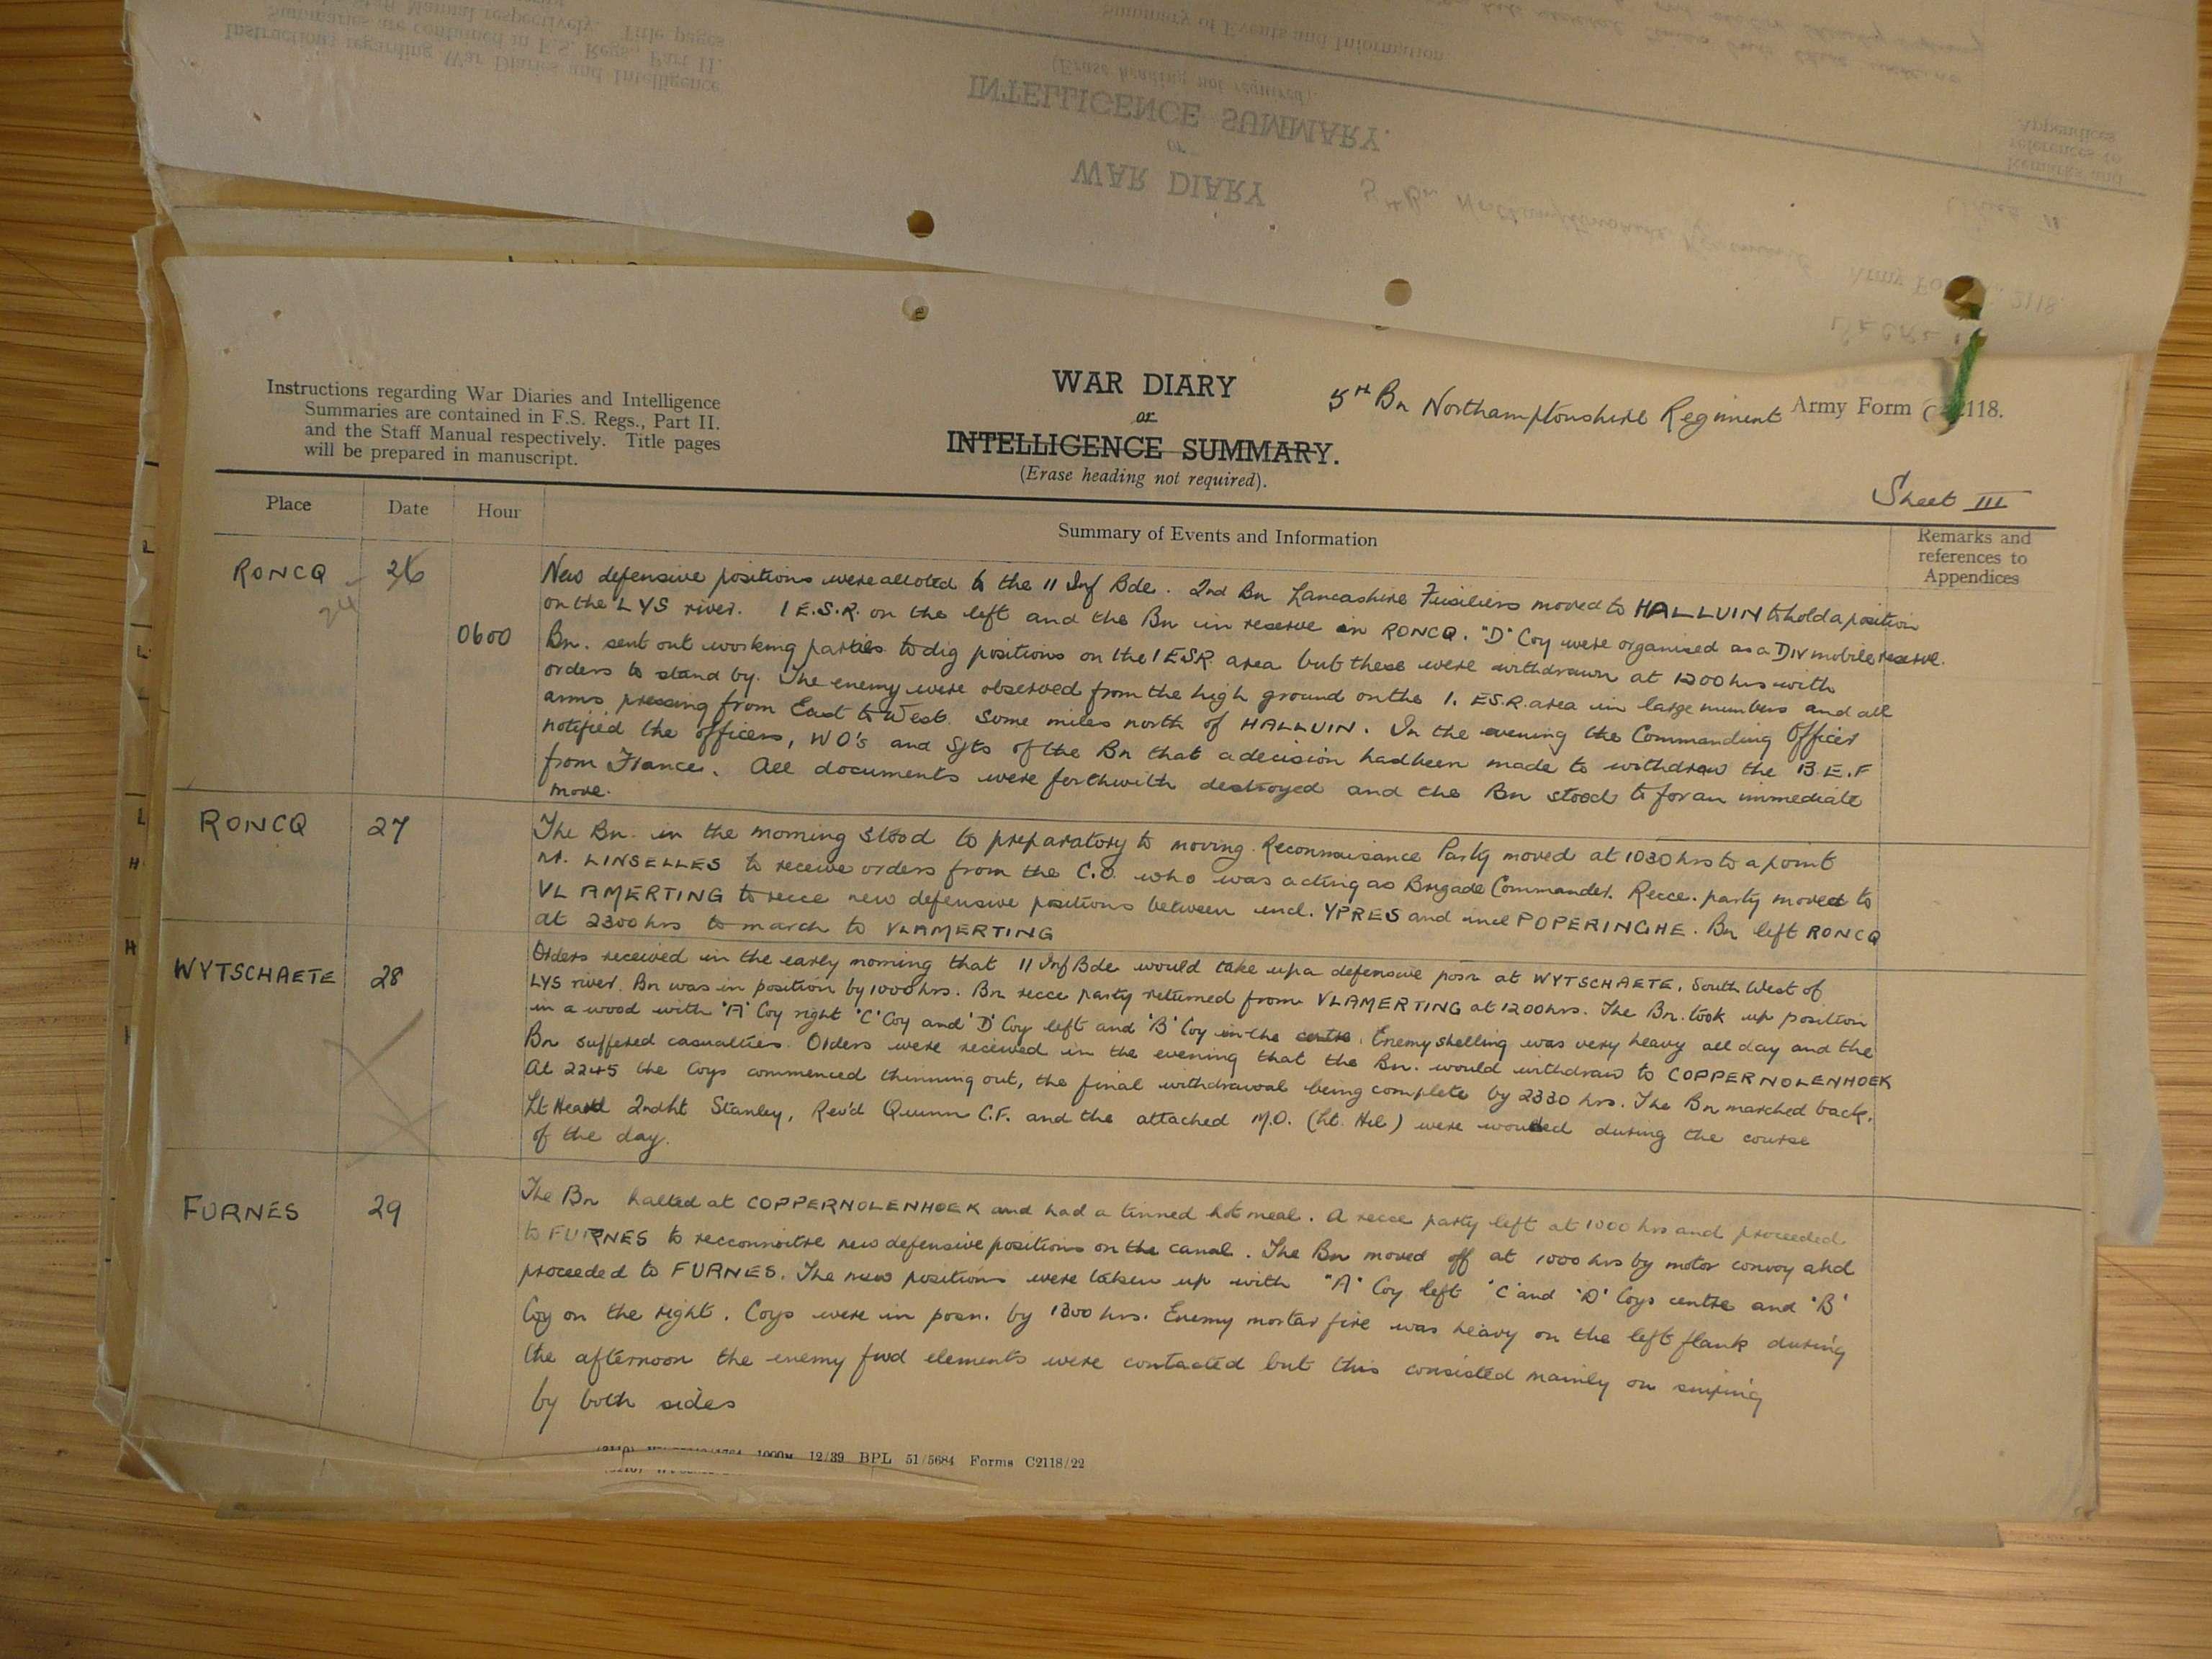 5th Battalion Northamptonshire Regiment / 25th May 1940